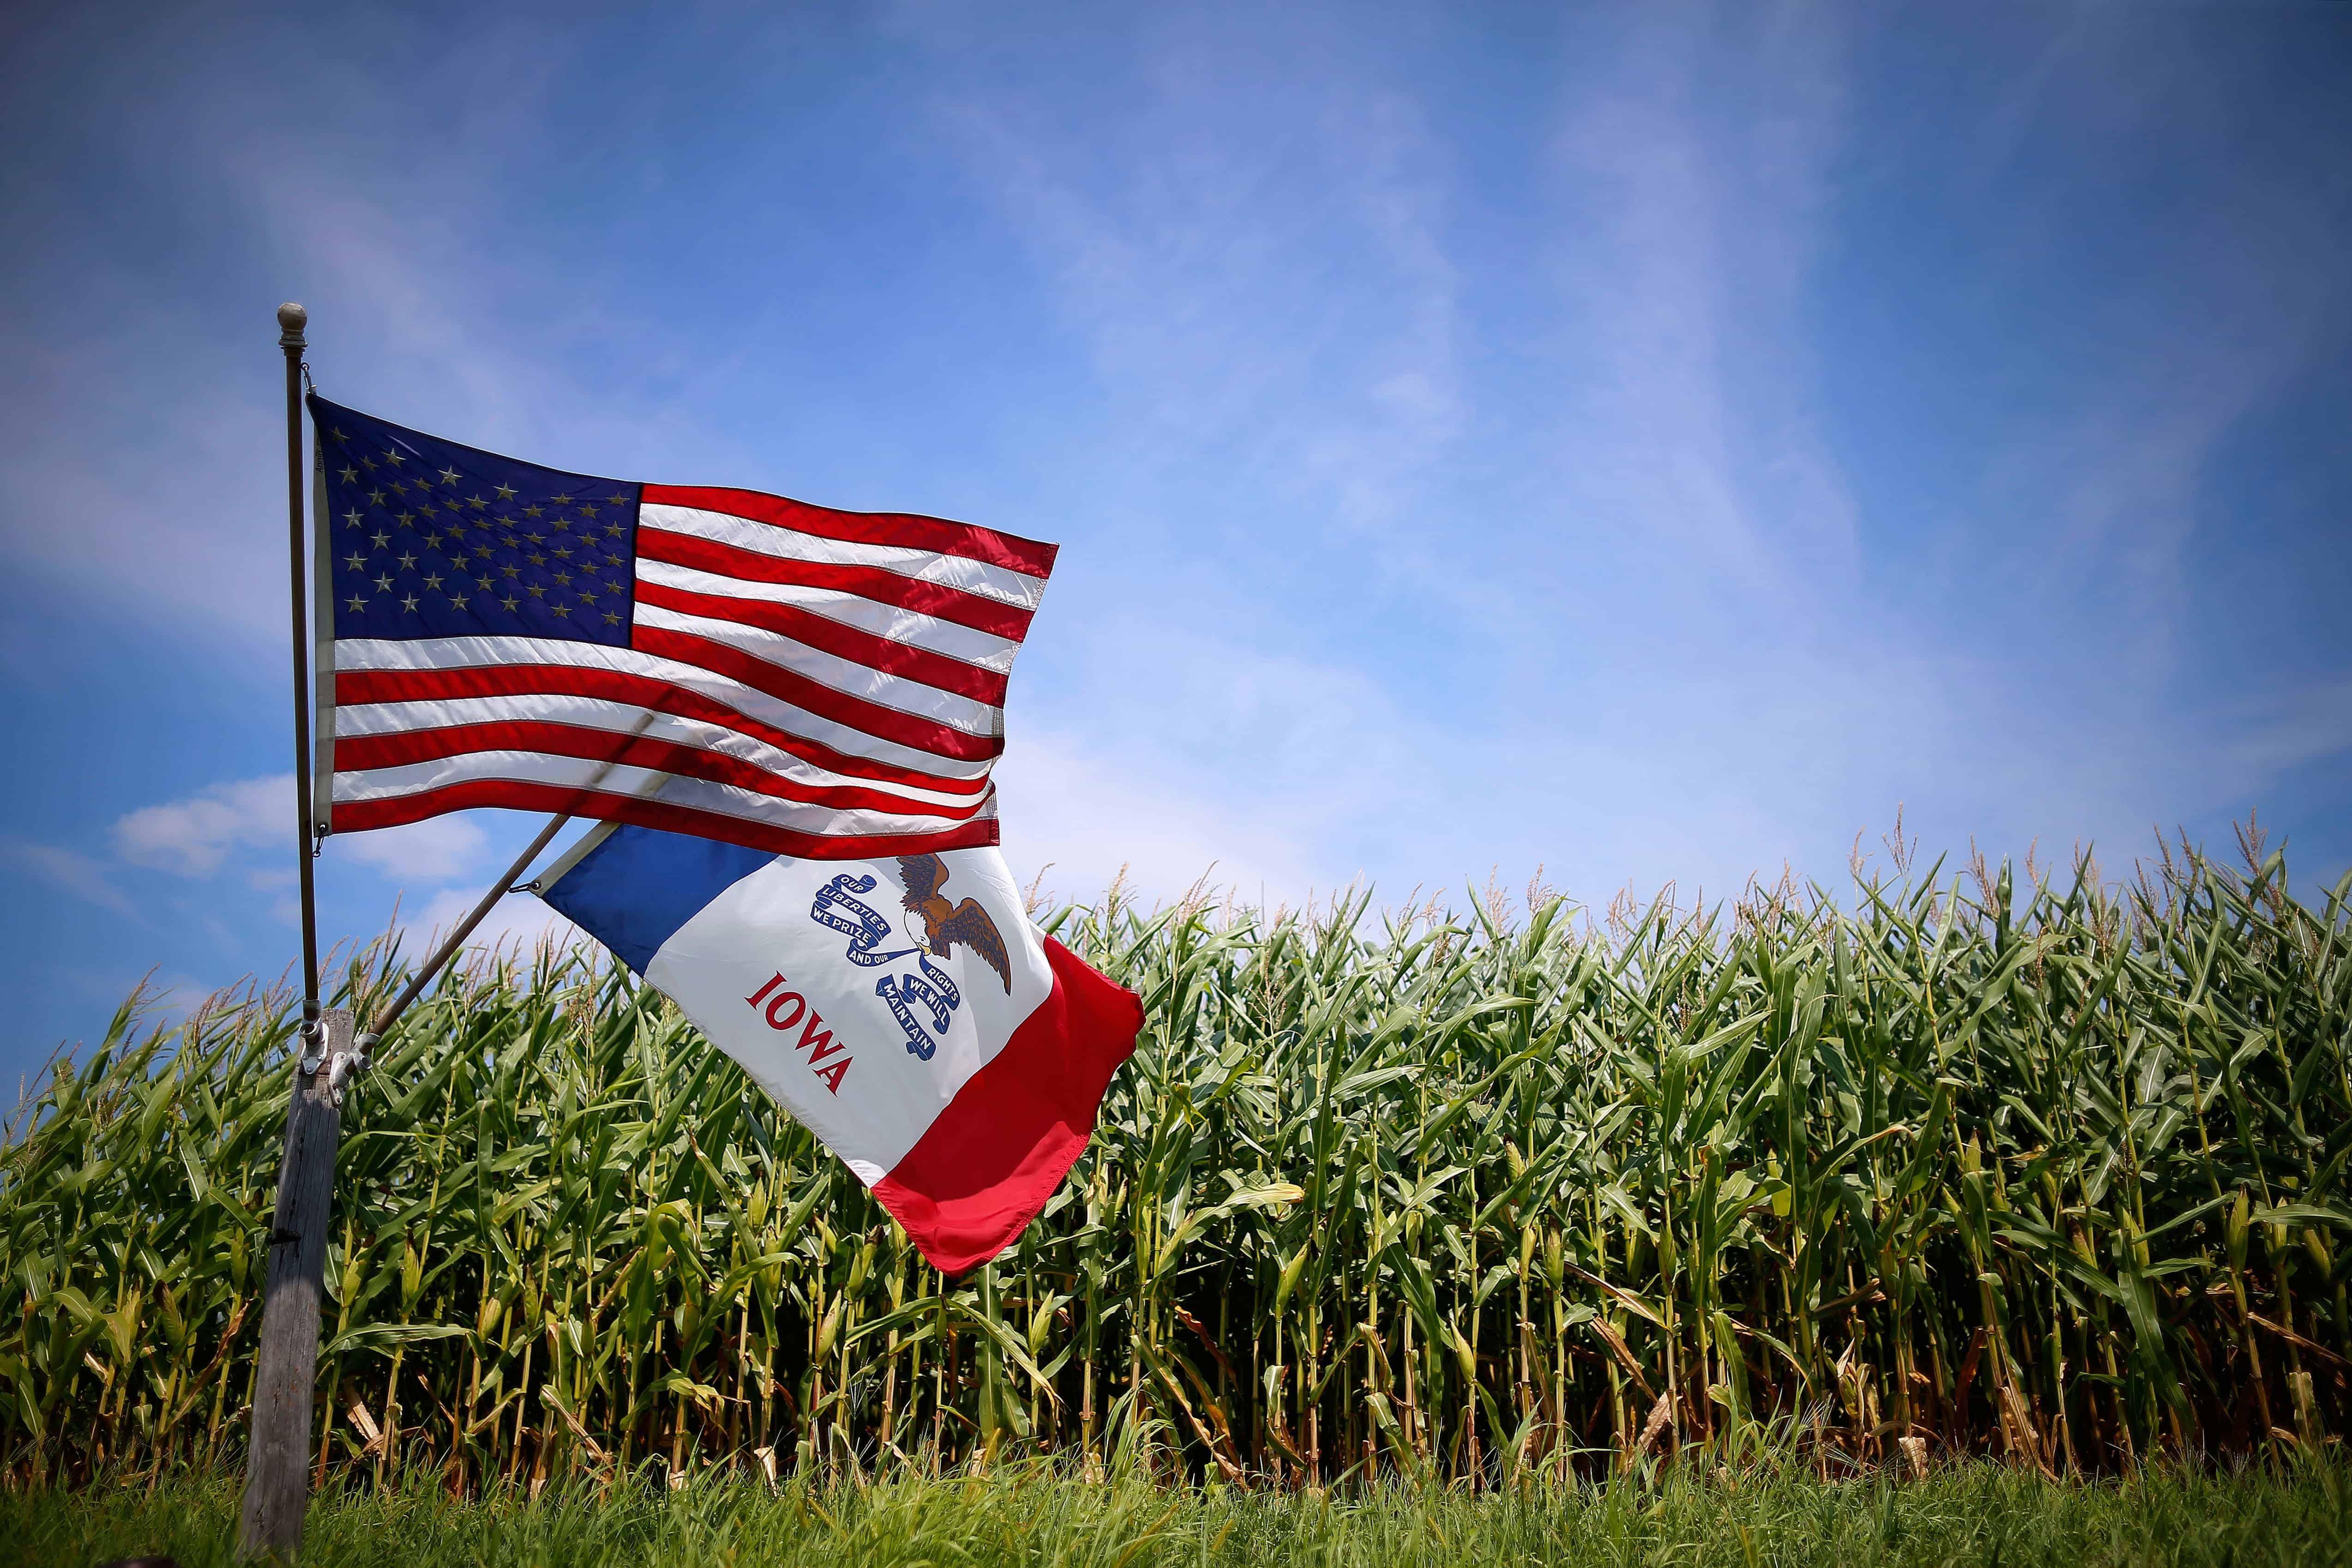 Feeling forgotten: Iowa's rural communities. (Photo by Jim Young/REUTERS)